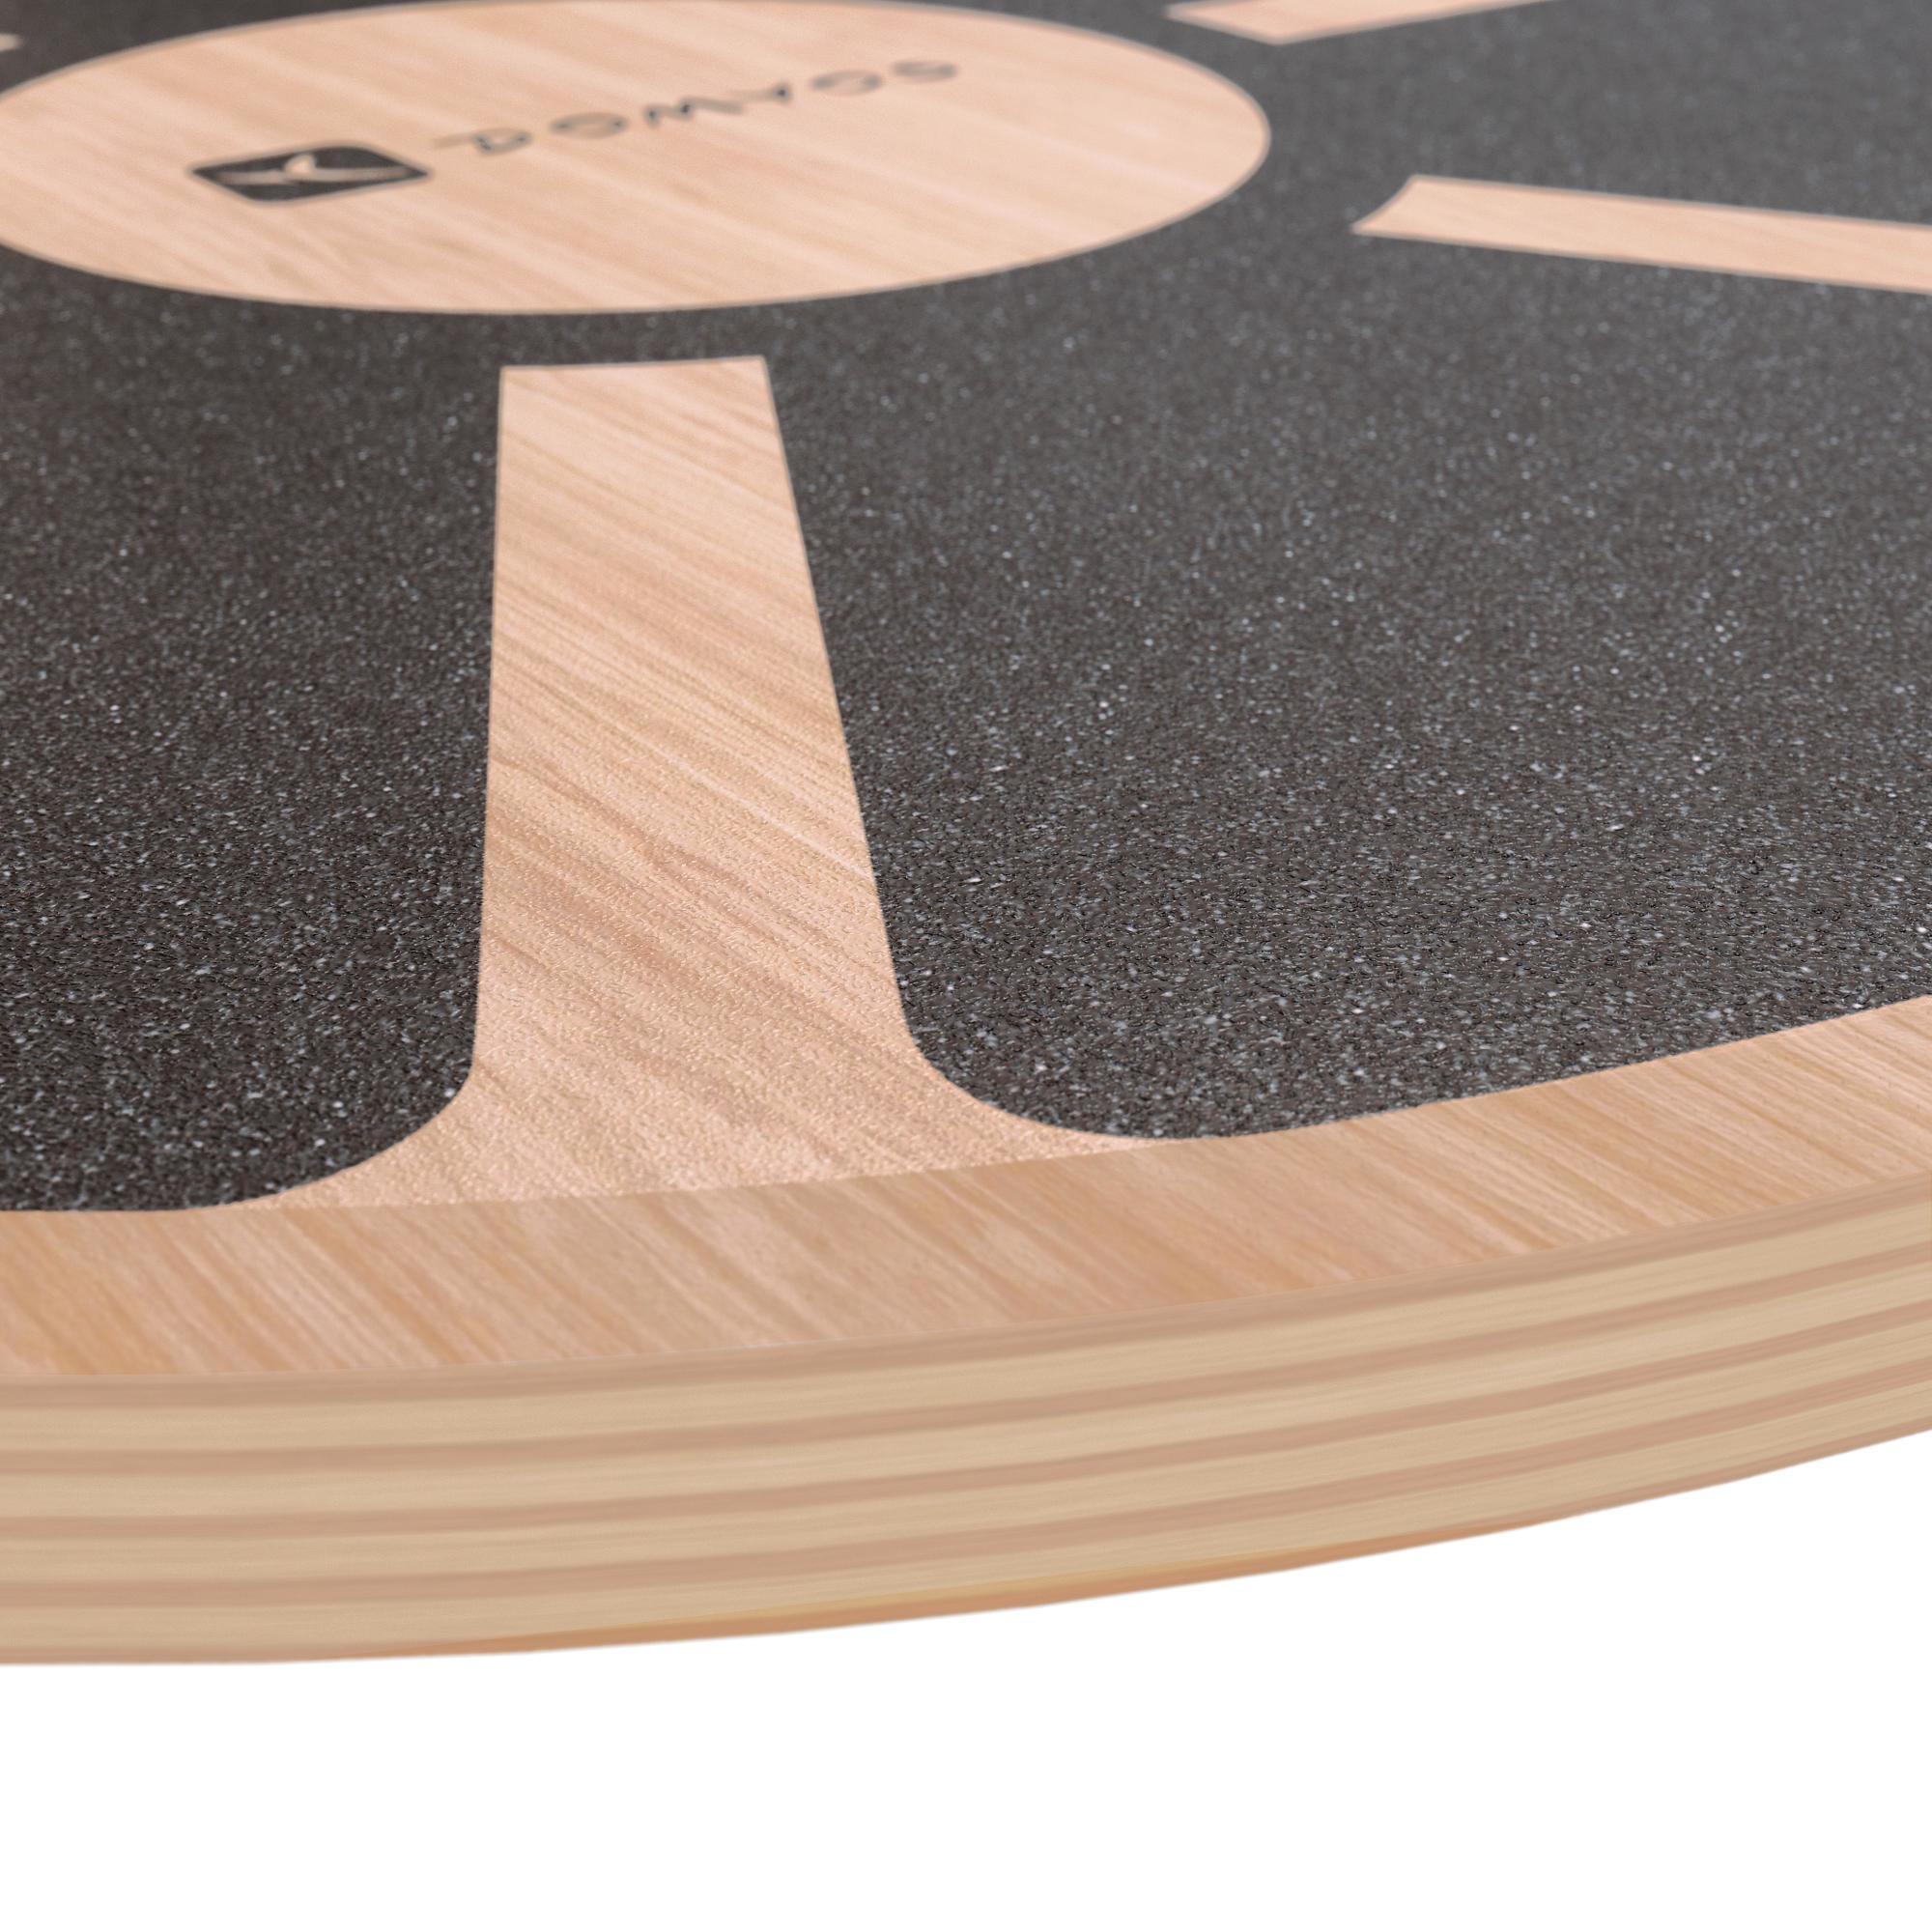 domyos balansbord voor pilates stretching 500 decathlon nlbalansbord voor pilates stretching 500